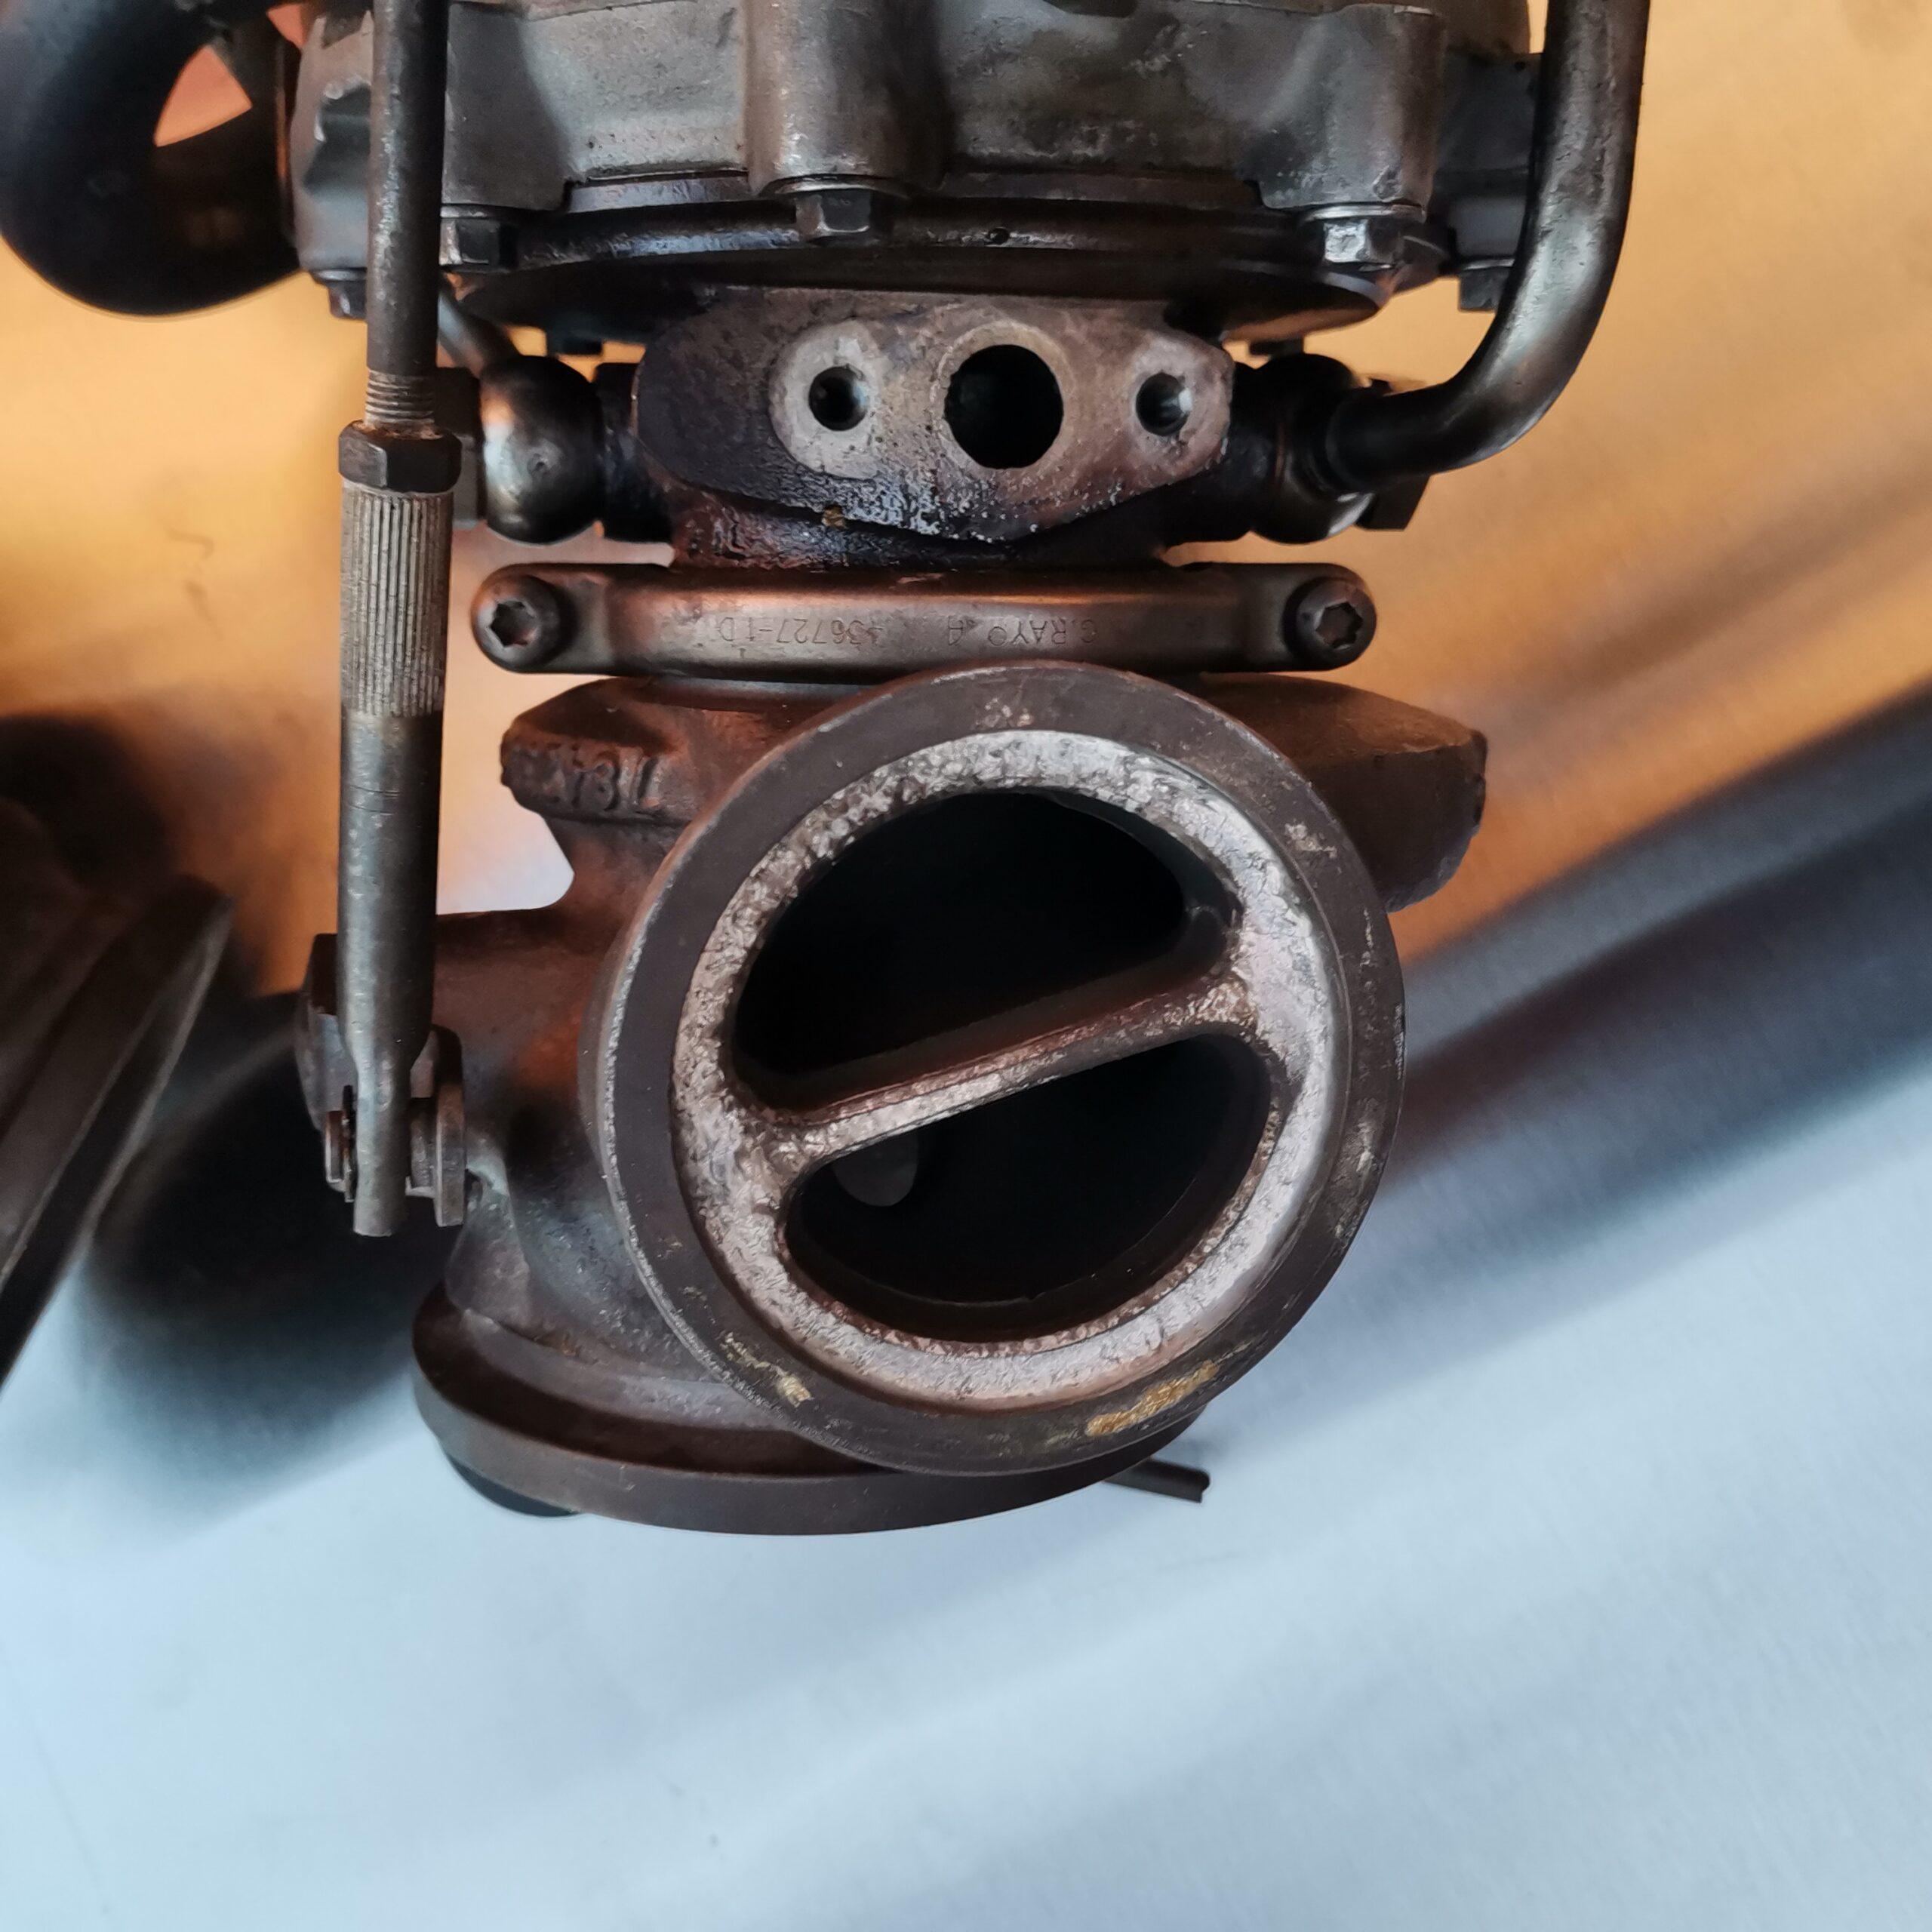 Сломанный турбокомпрессор на BMW X5 E70